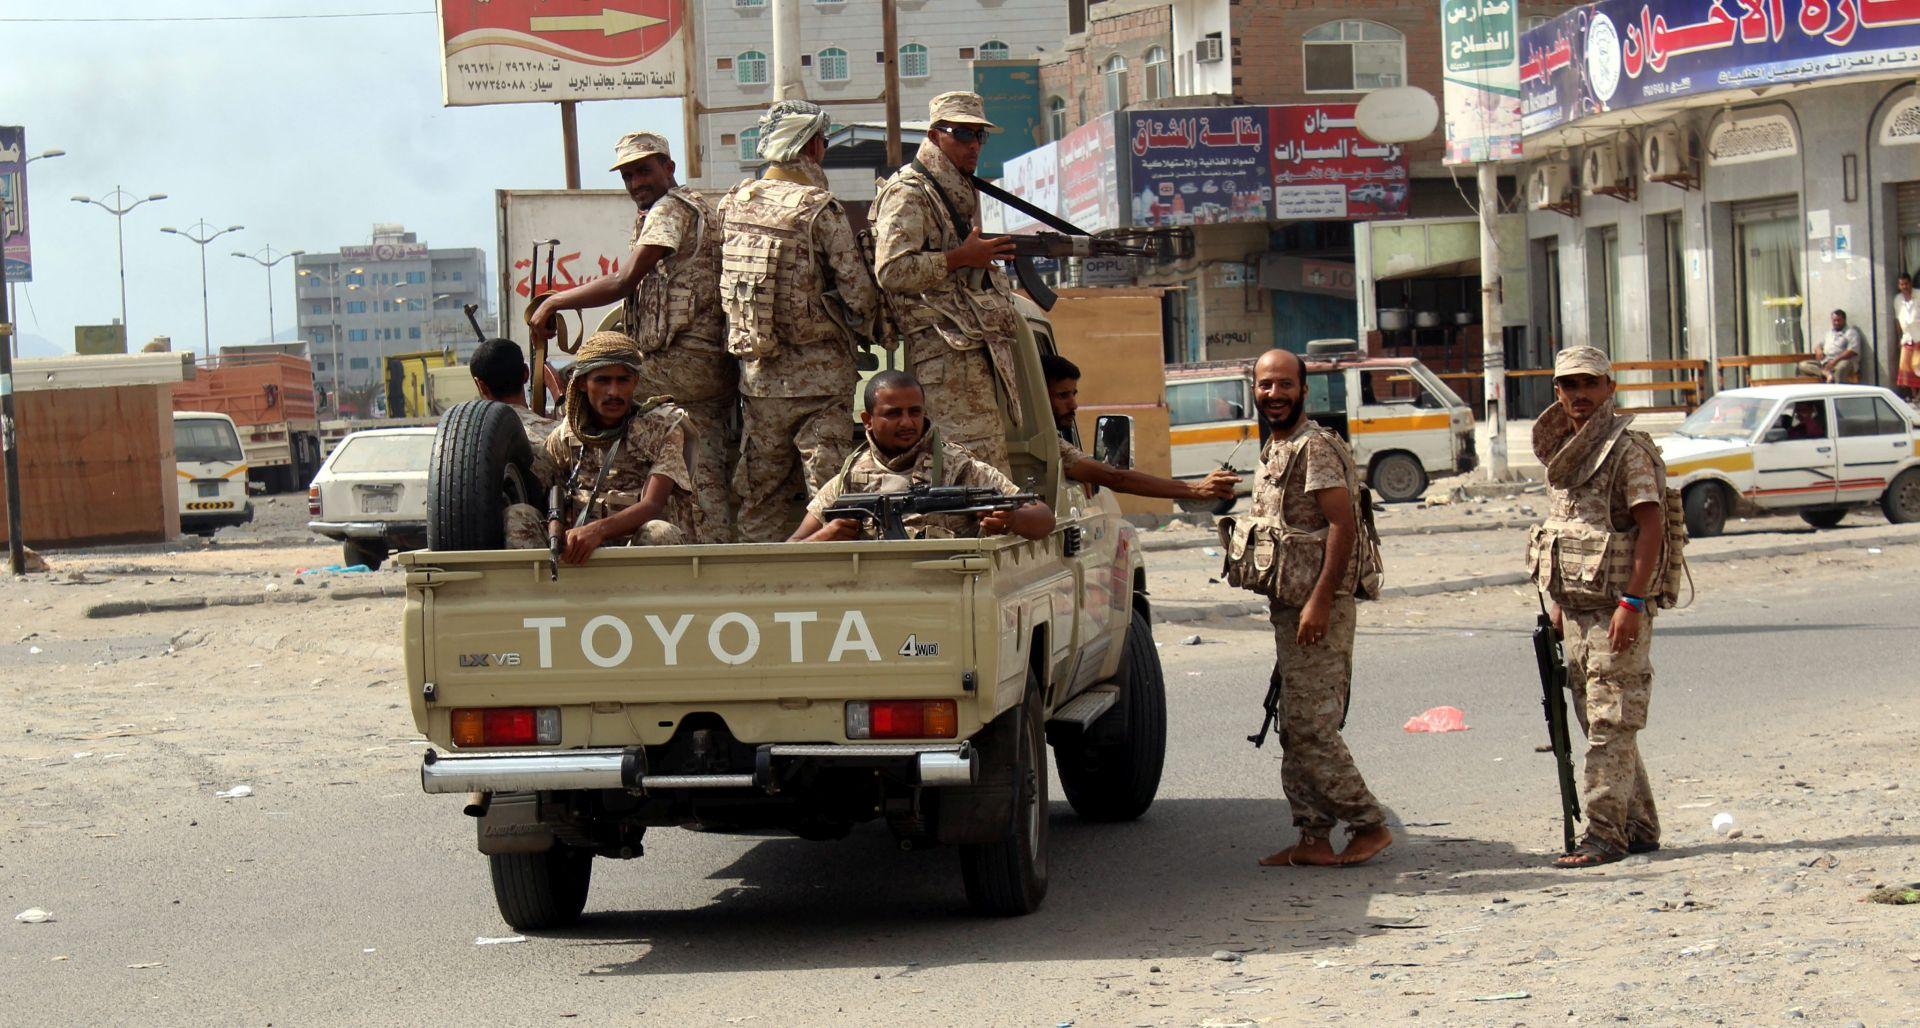 Jemenska policija osujetila dva bombaška napada uoči mirovnih pregovora